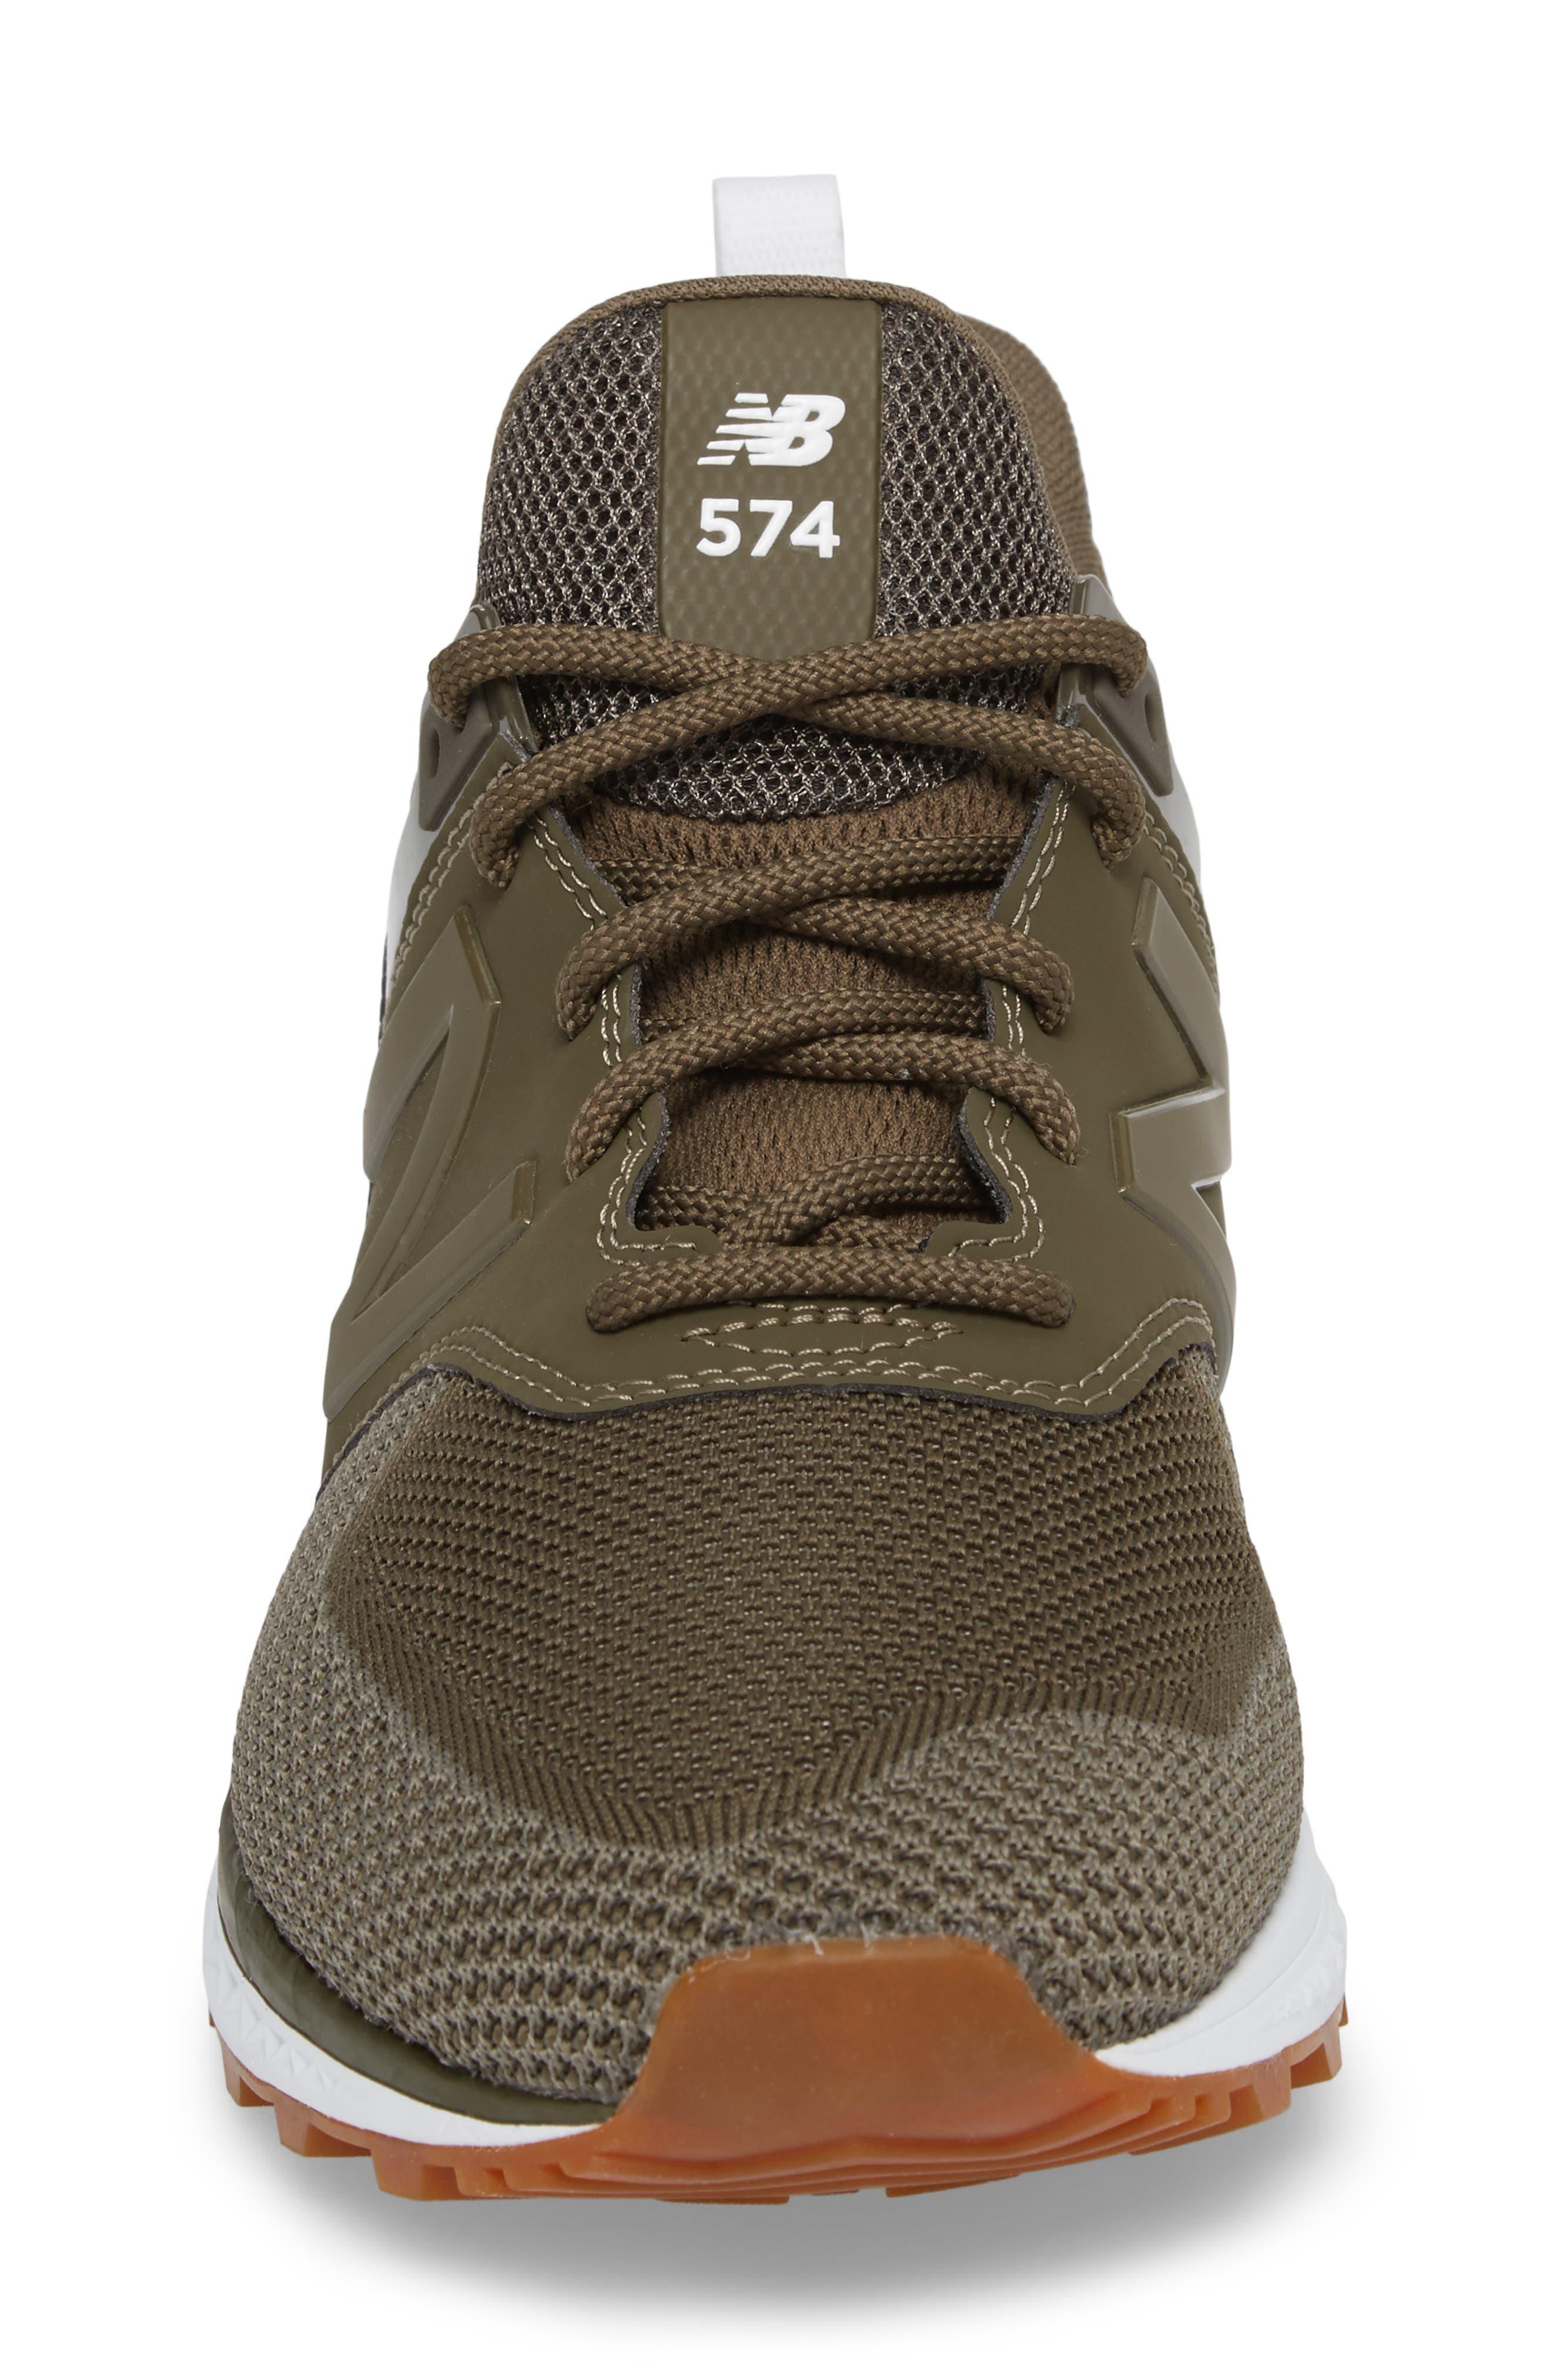 574 Engineered Mesh Sneaker,                             Alternate thumbnail 4, color,                             338